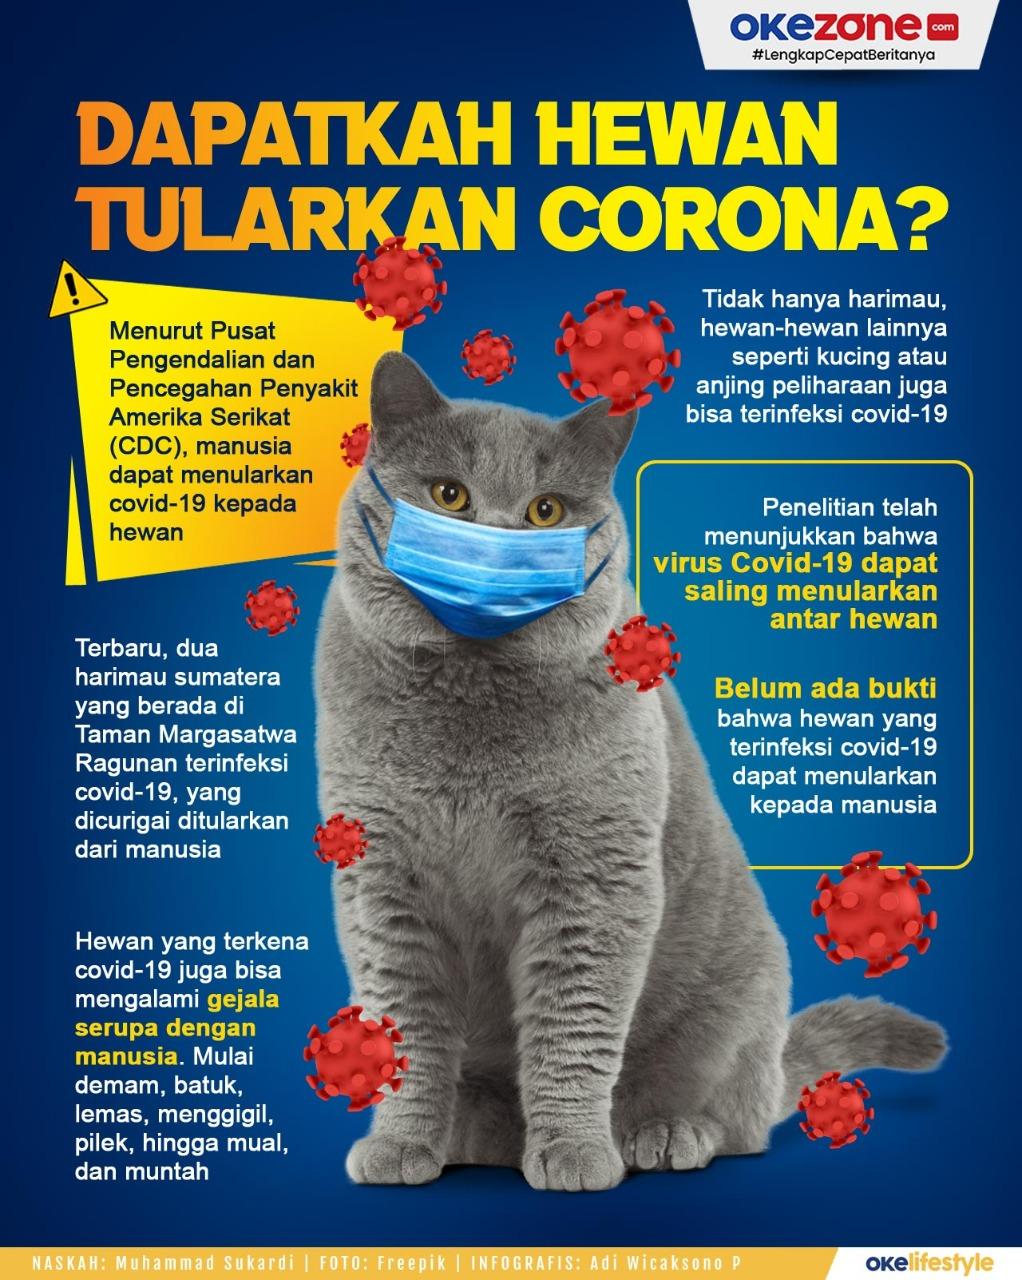 Dapatkah Hewan Tularkan Corona? -